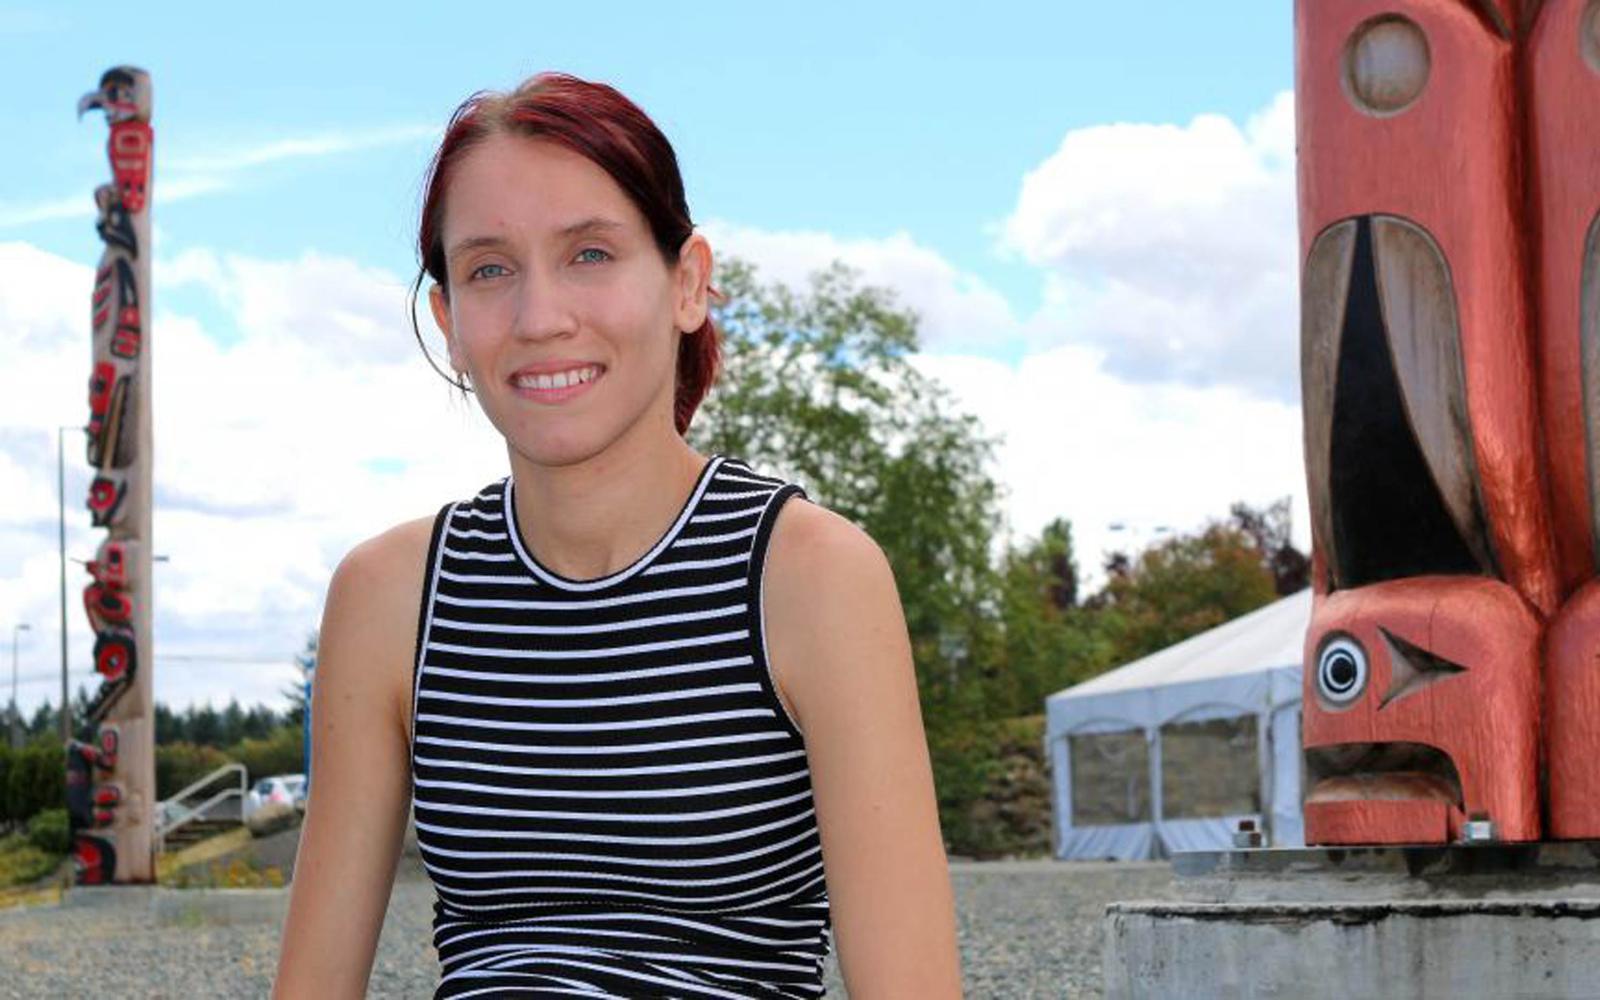 Community Health Promotion for Aboriginal Communities Student, Megan Newman